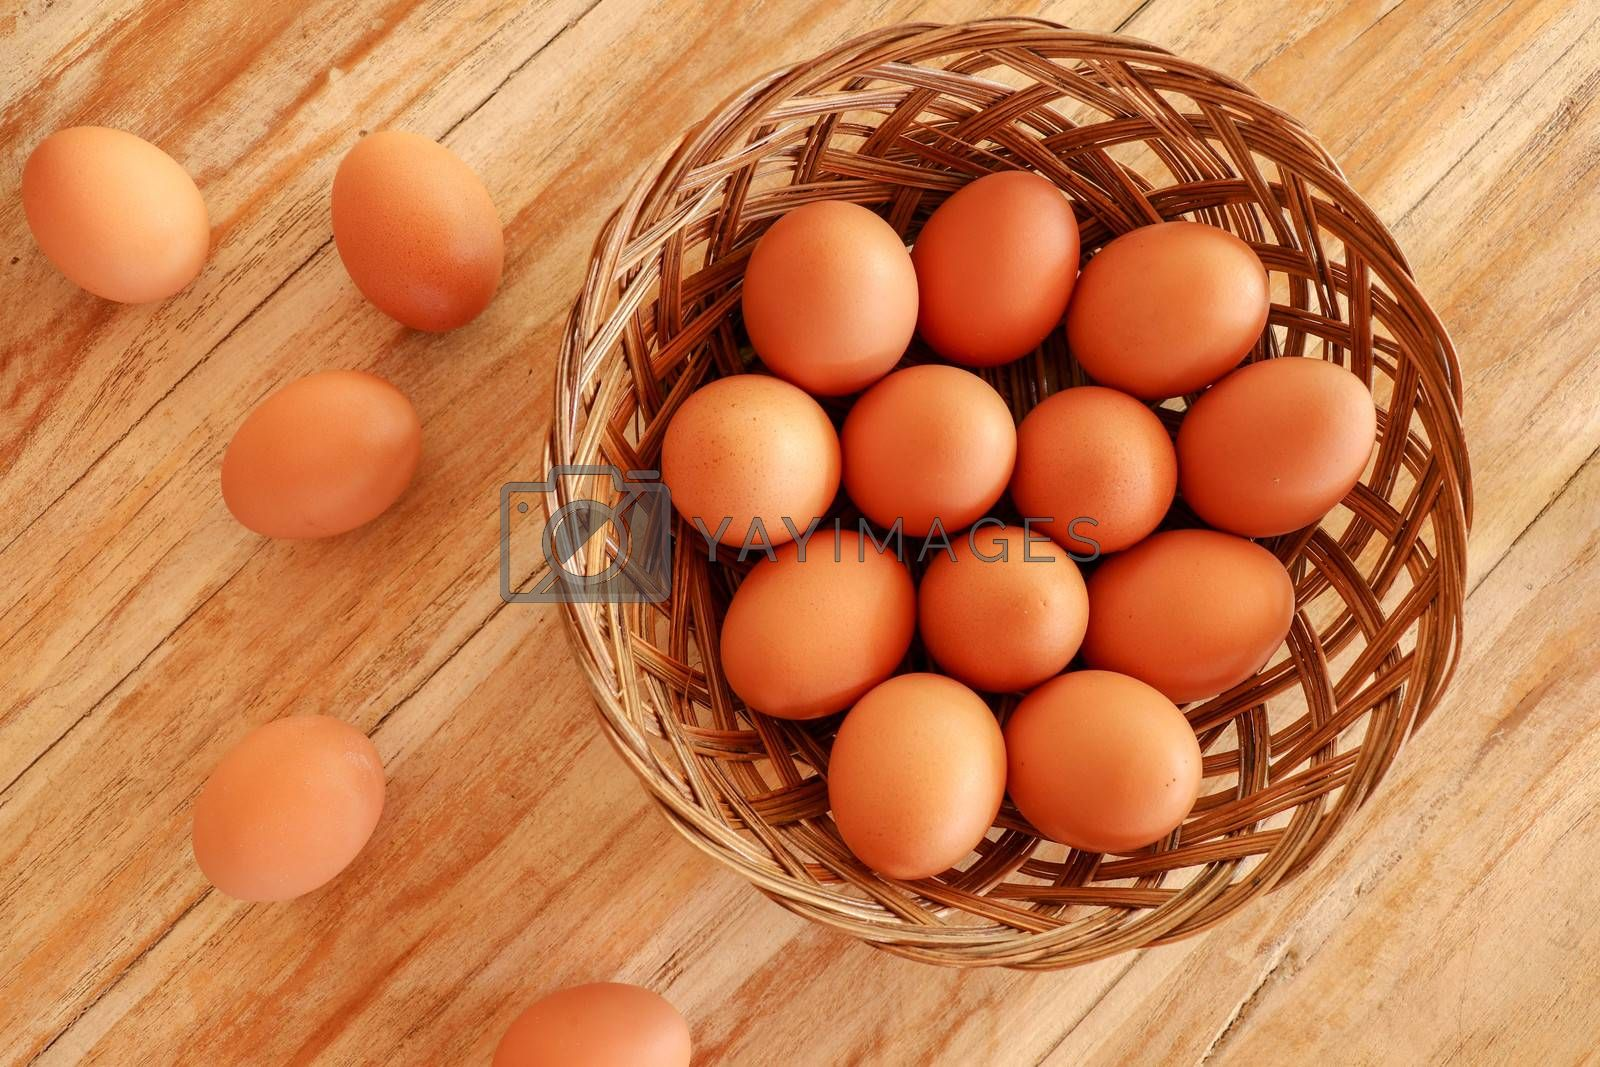 Top view of brown eggs in a wicker basket. Eggs in a wooden basket on a wooden table.